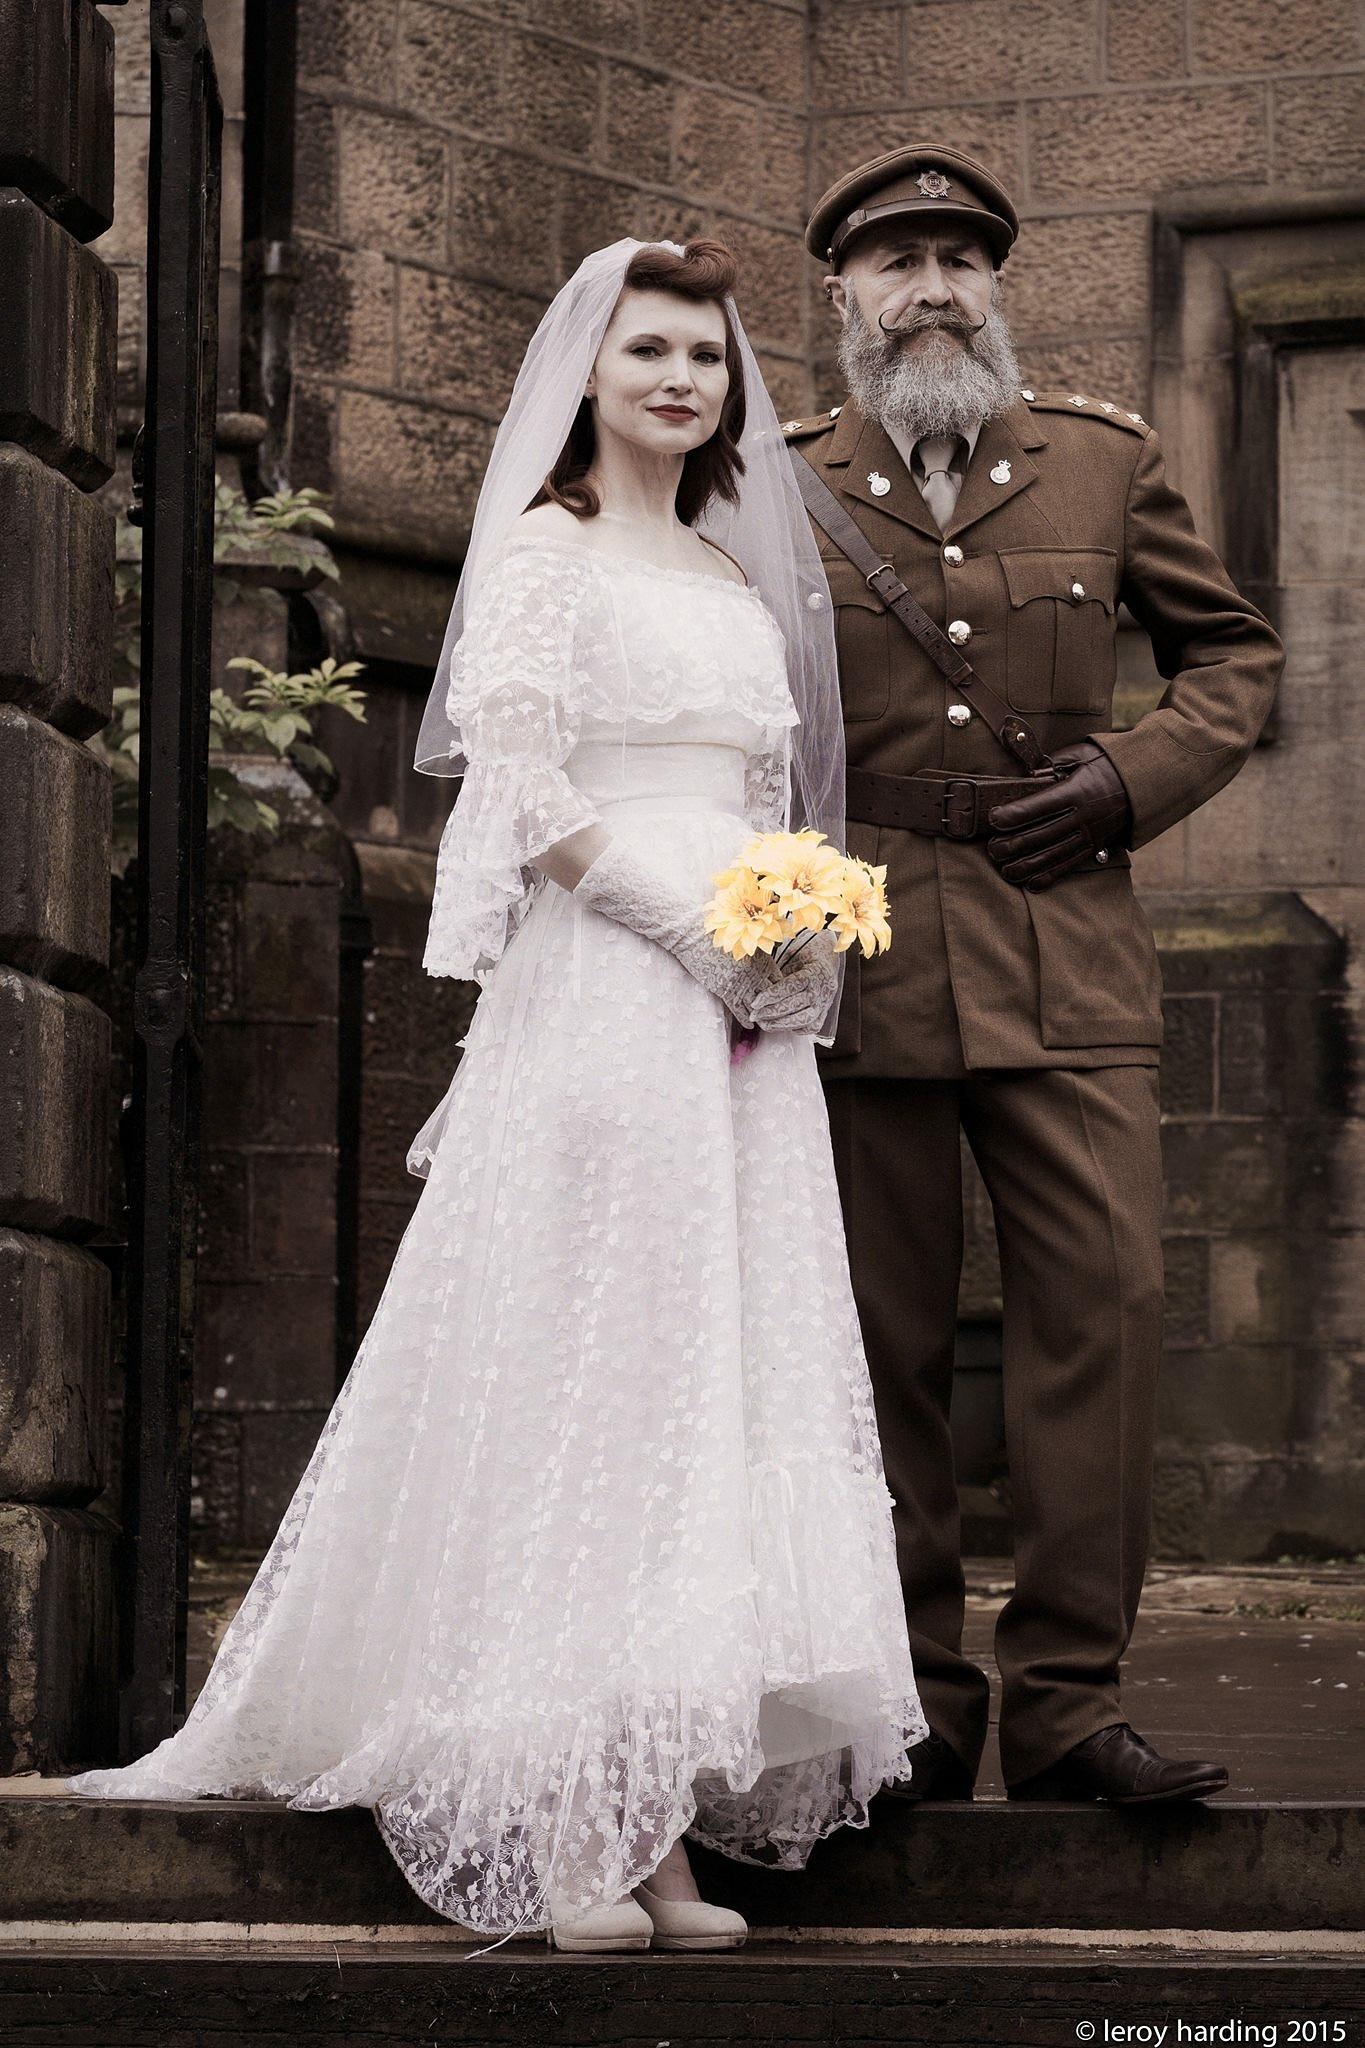 Vintage Wedding. by philip.atkins